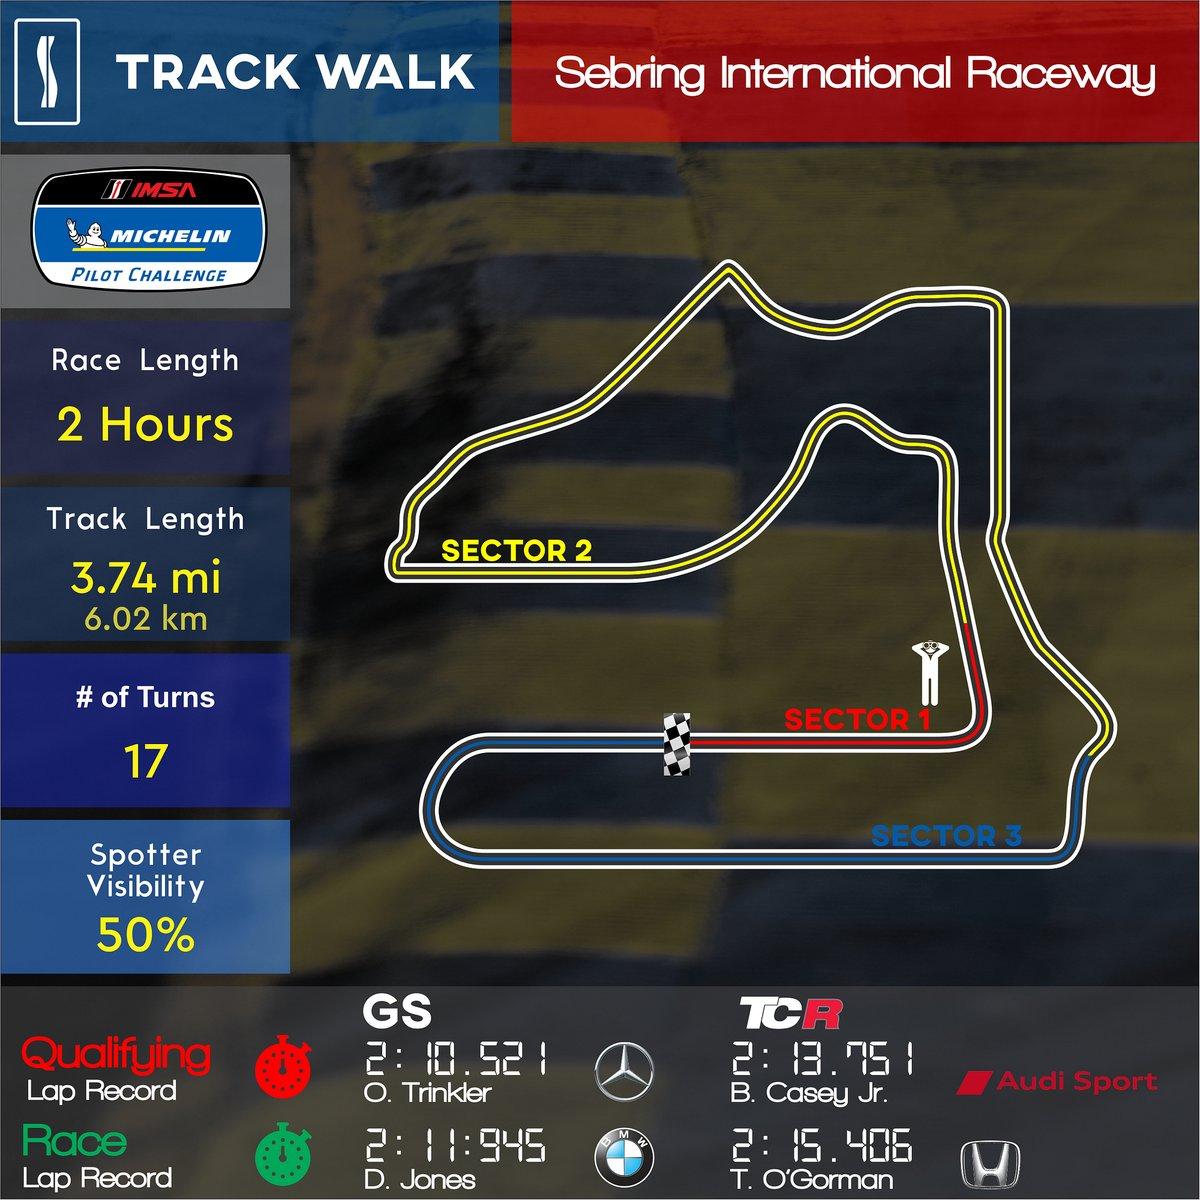 [SC Track Walk] Come with us for a lap of the 17-turn, 3.76 mile @sebringraceway   #Sebring #IMSA #GT4 #TCR #McLaren #AudiSport #TrackWalk https://t.co/mGaLHVvZTV